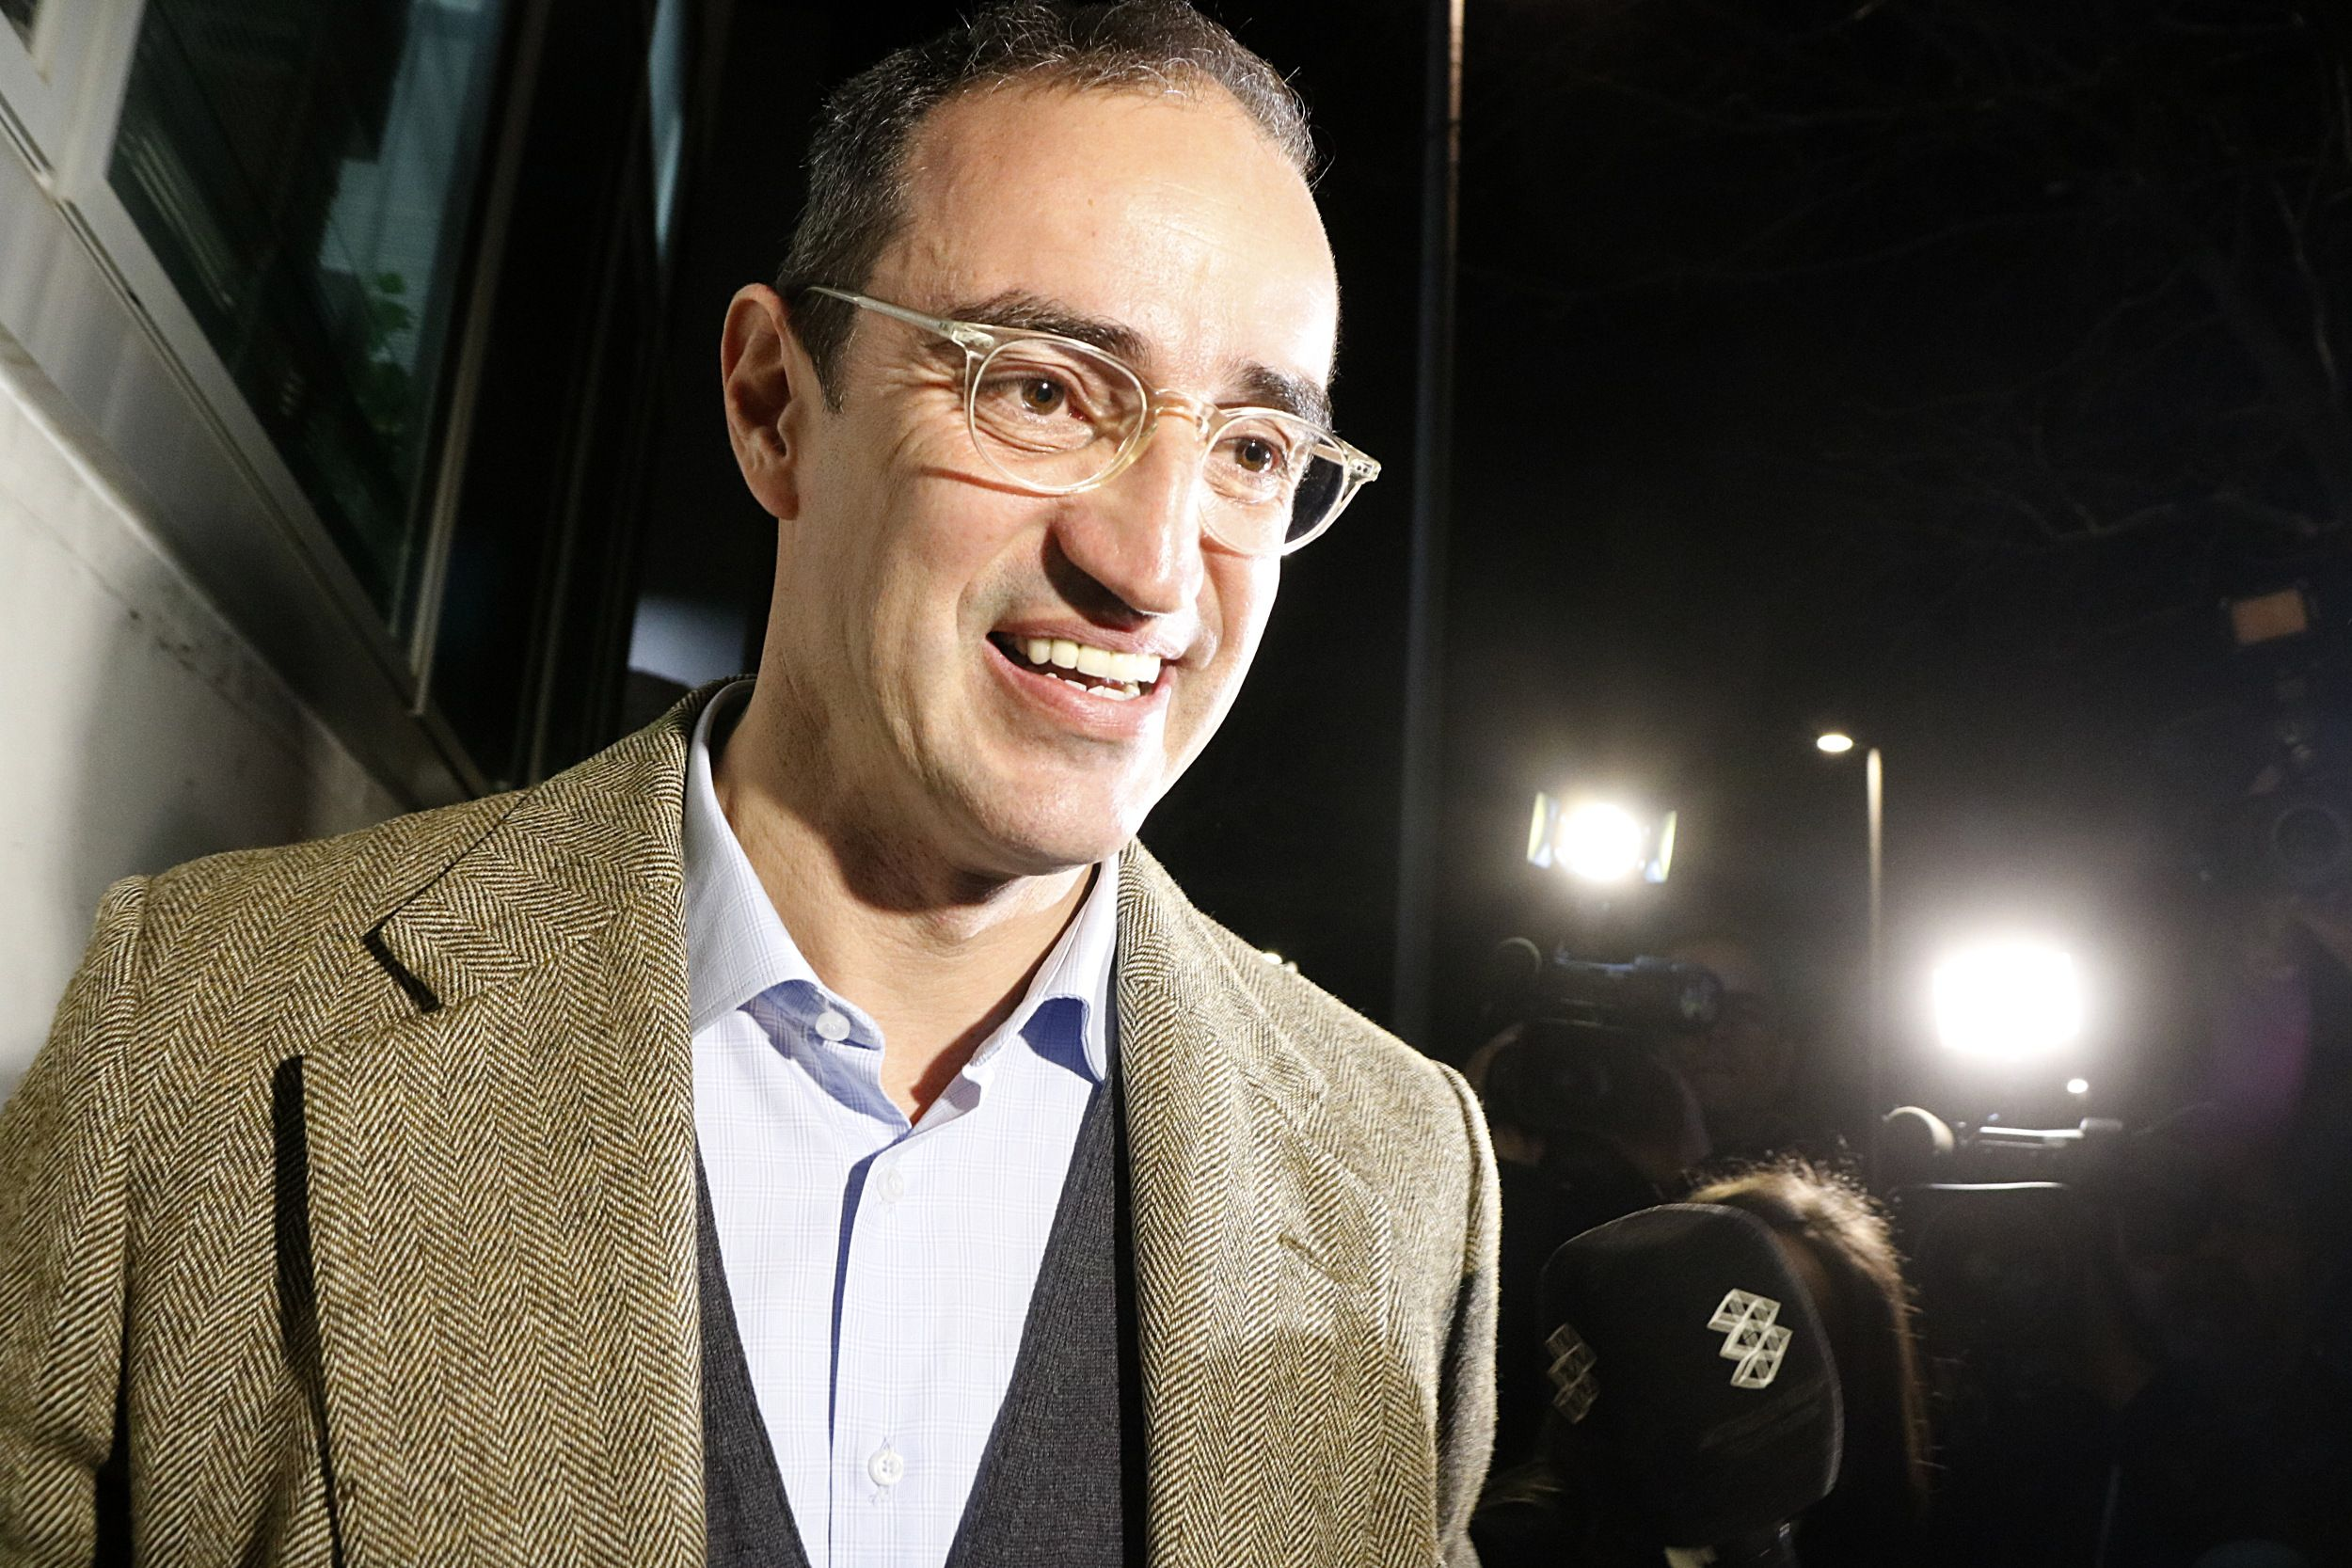 Antoni Vives / ACN